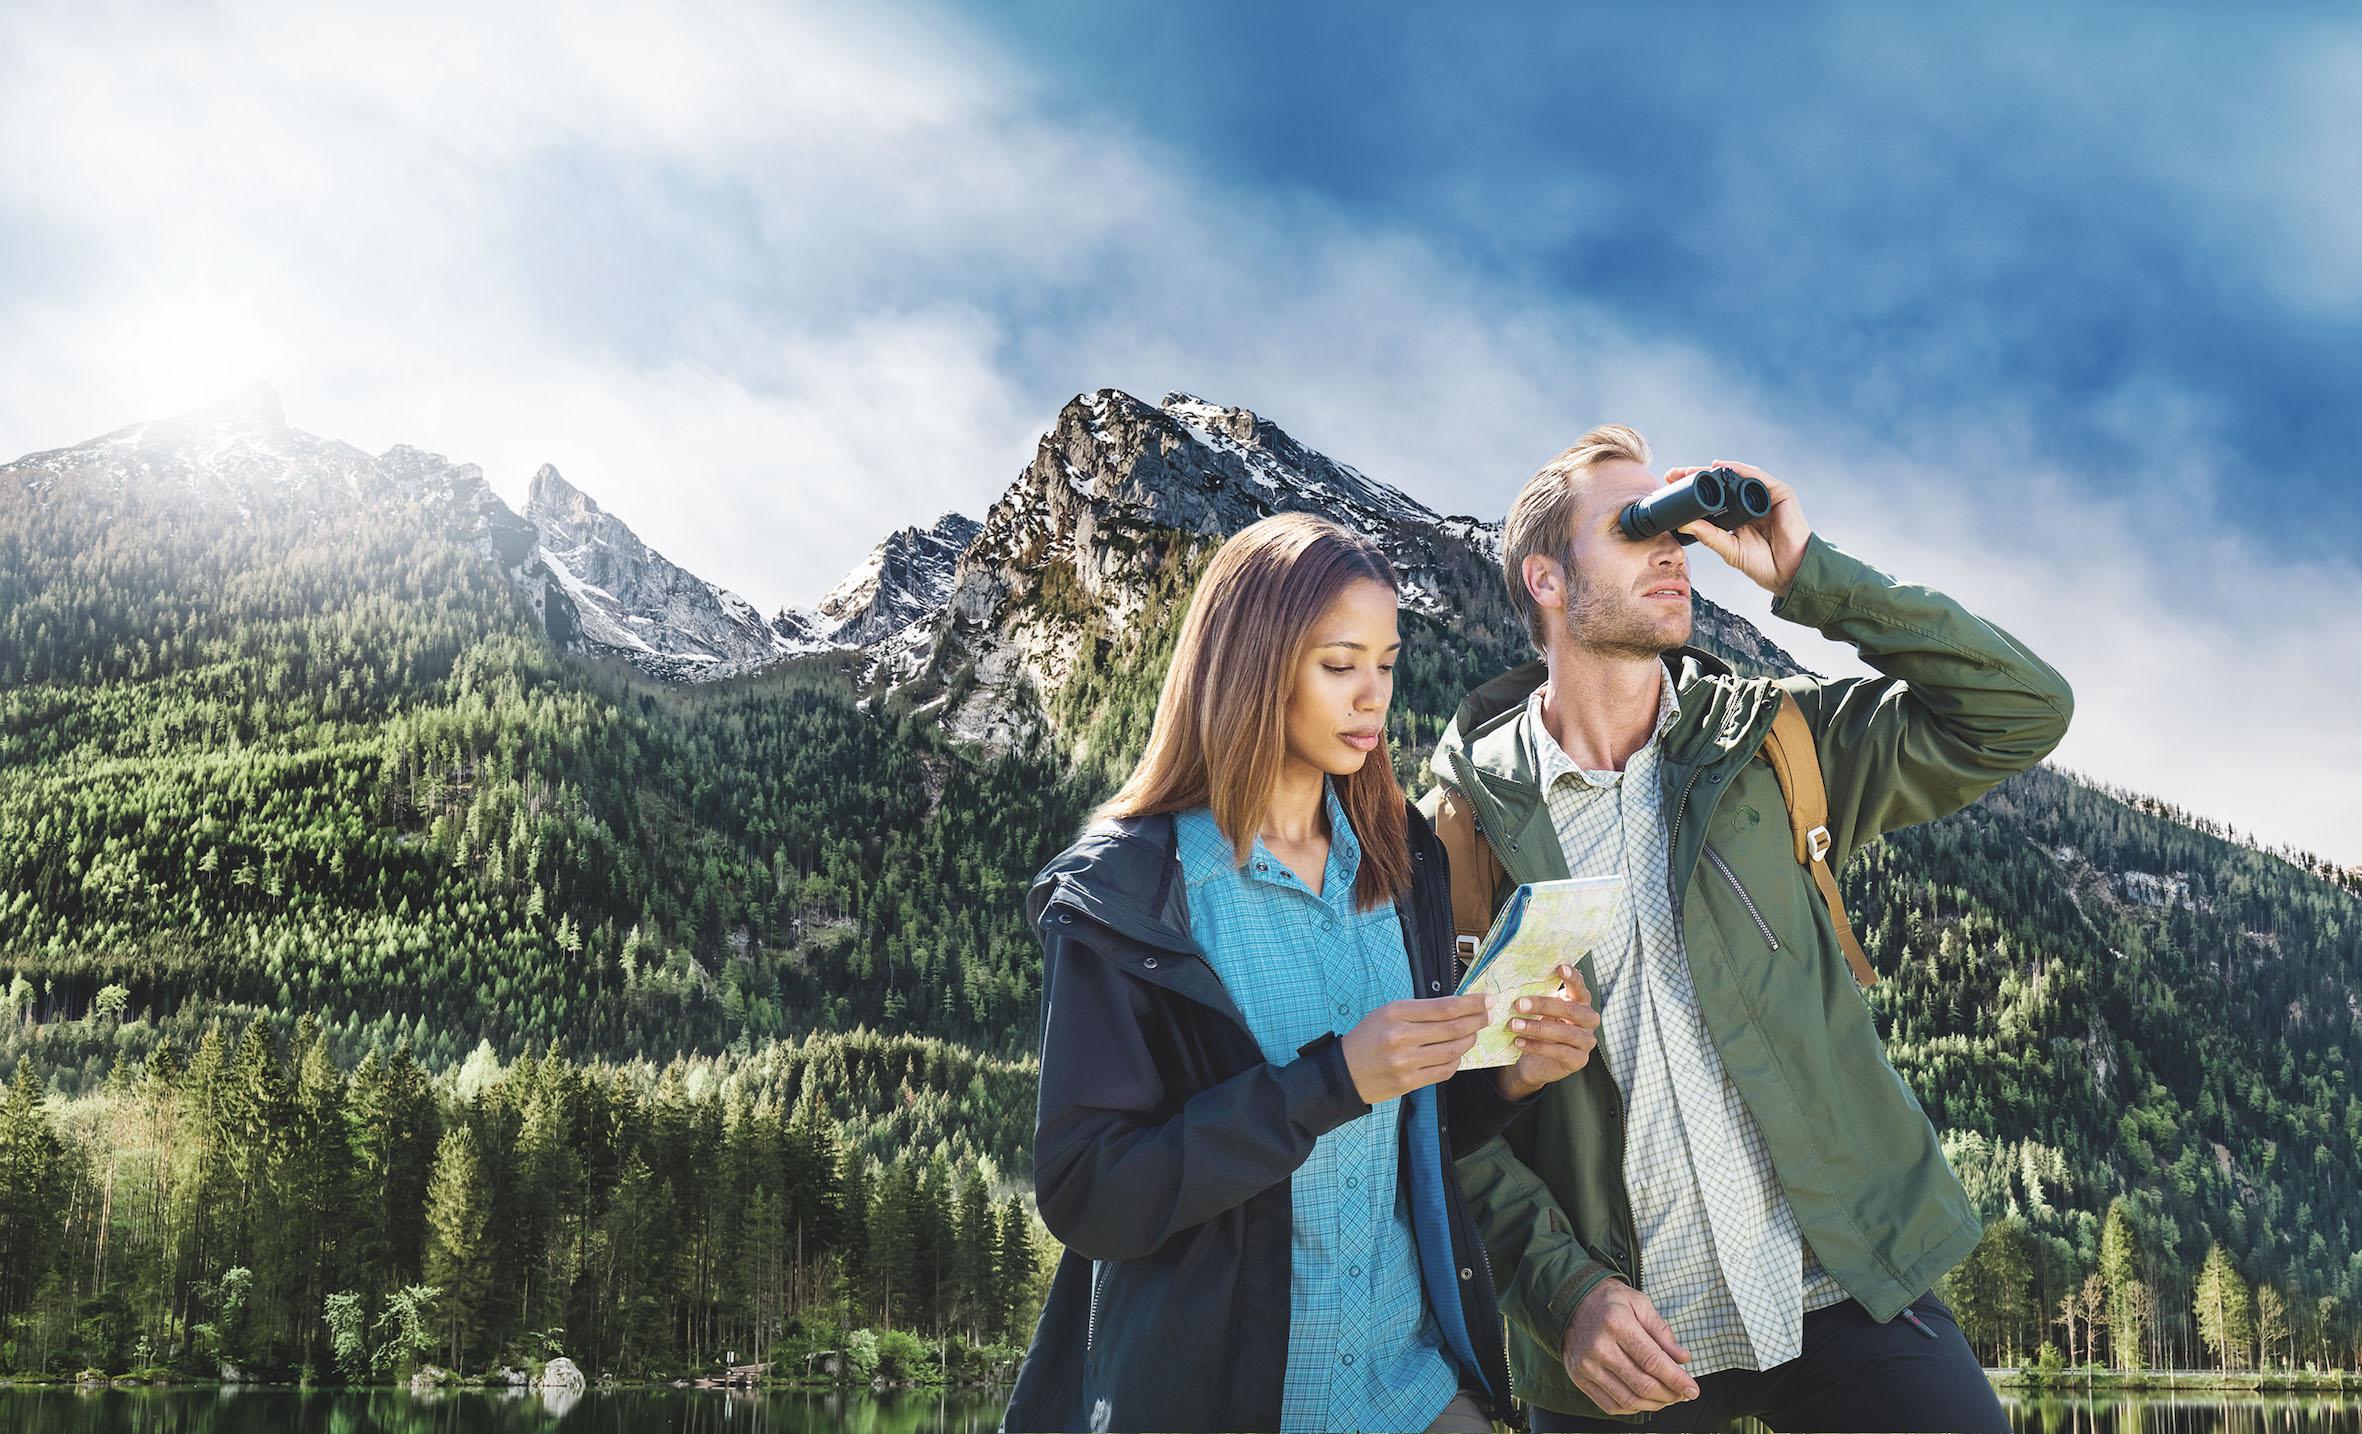 Bergtour mit Fernglas